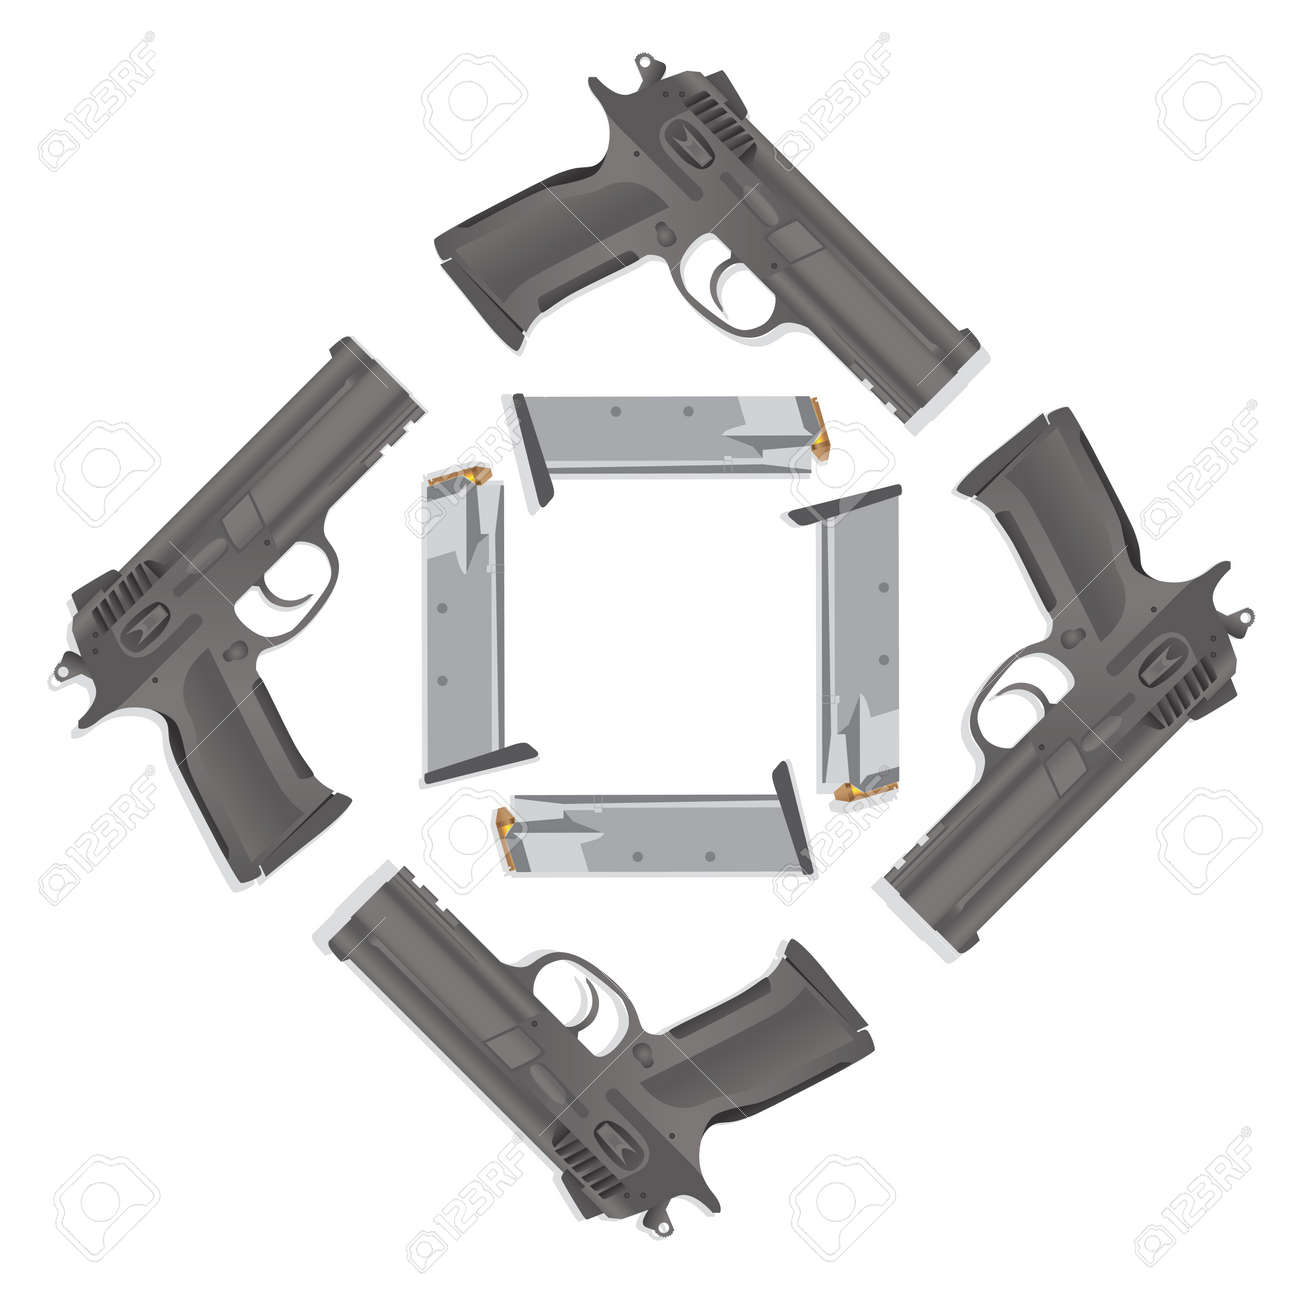 isolated gun detailed realistic illustration Stock Vector - 11904558